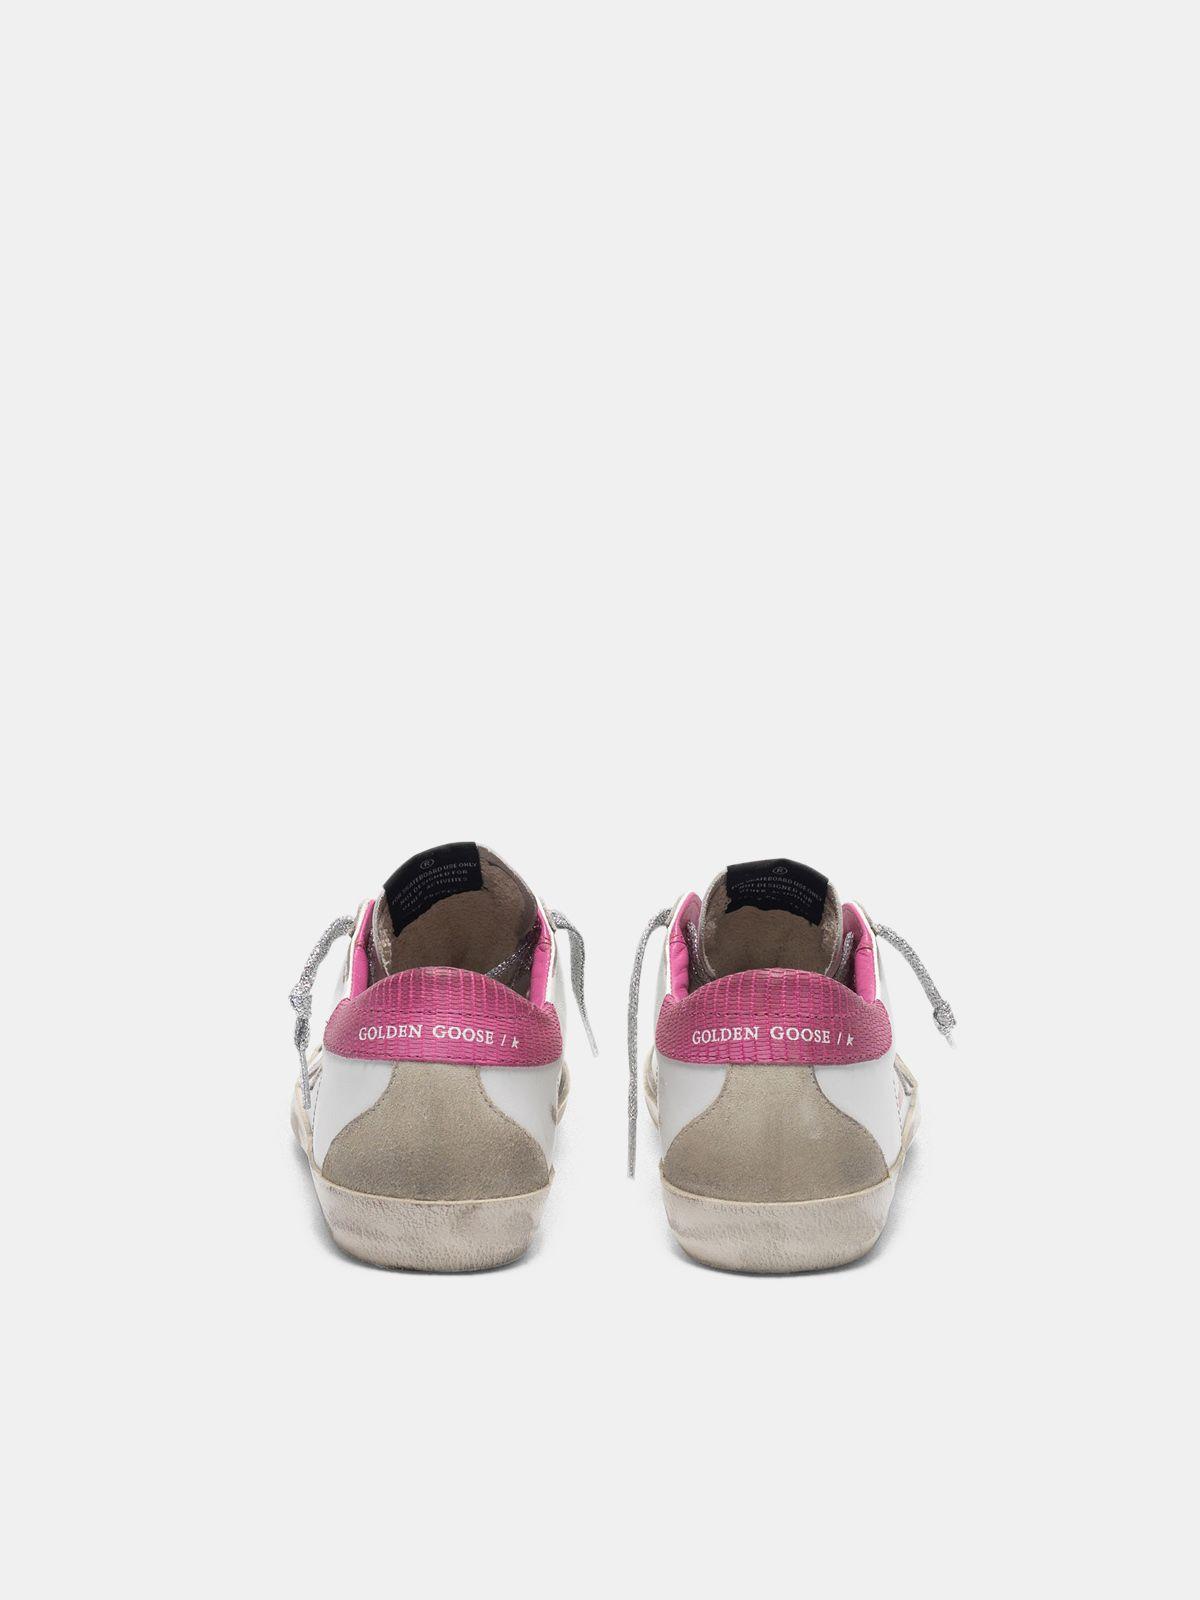 Golden Goose - White Super-Star sneakers with fuchsia lizard-print heel tab in